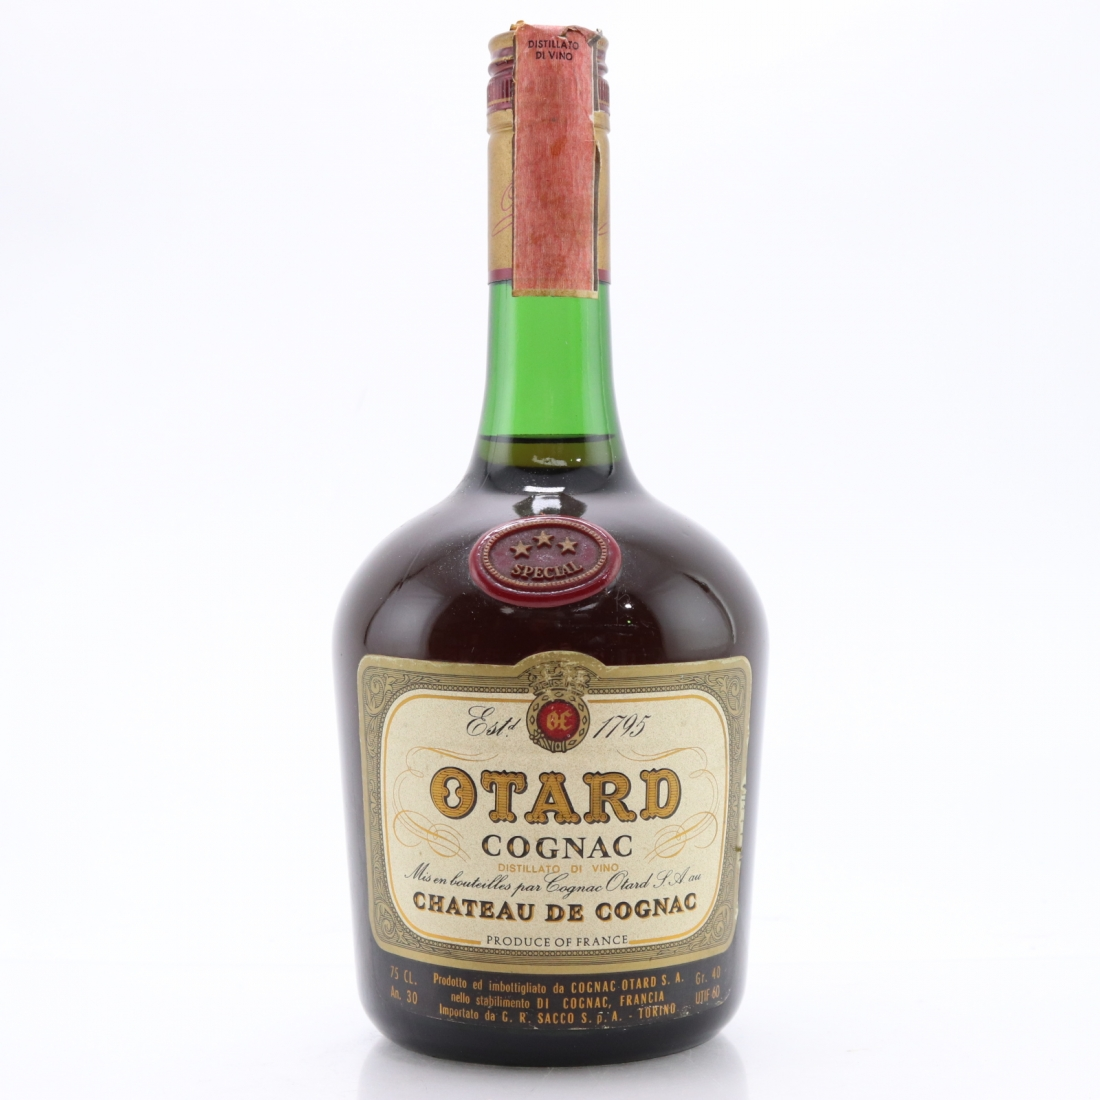 Otard 3 Star Special Cognac 1970s